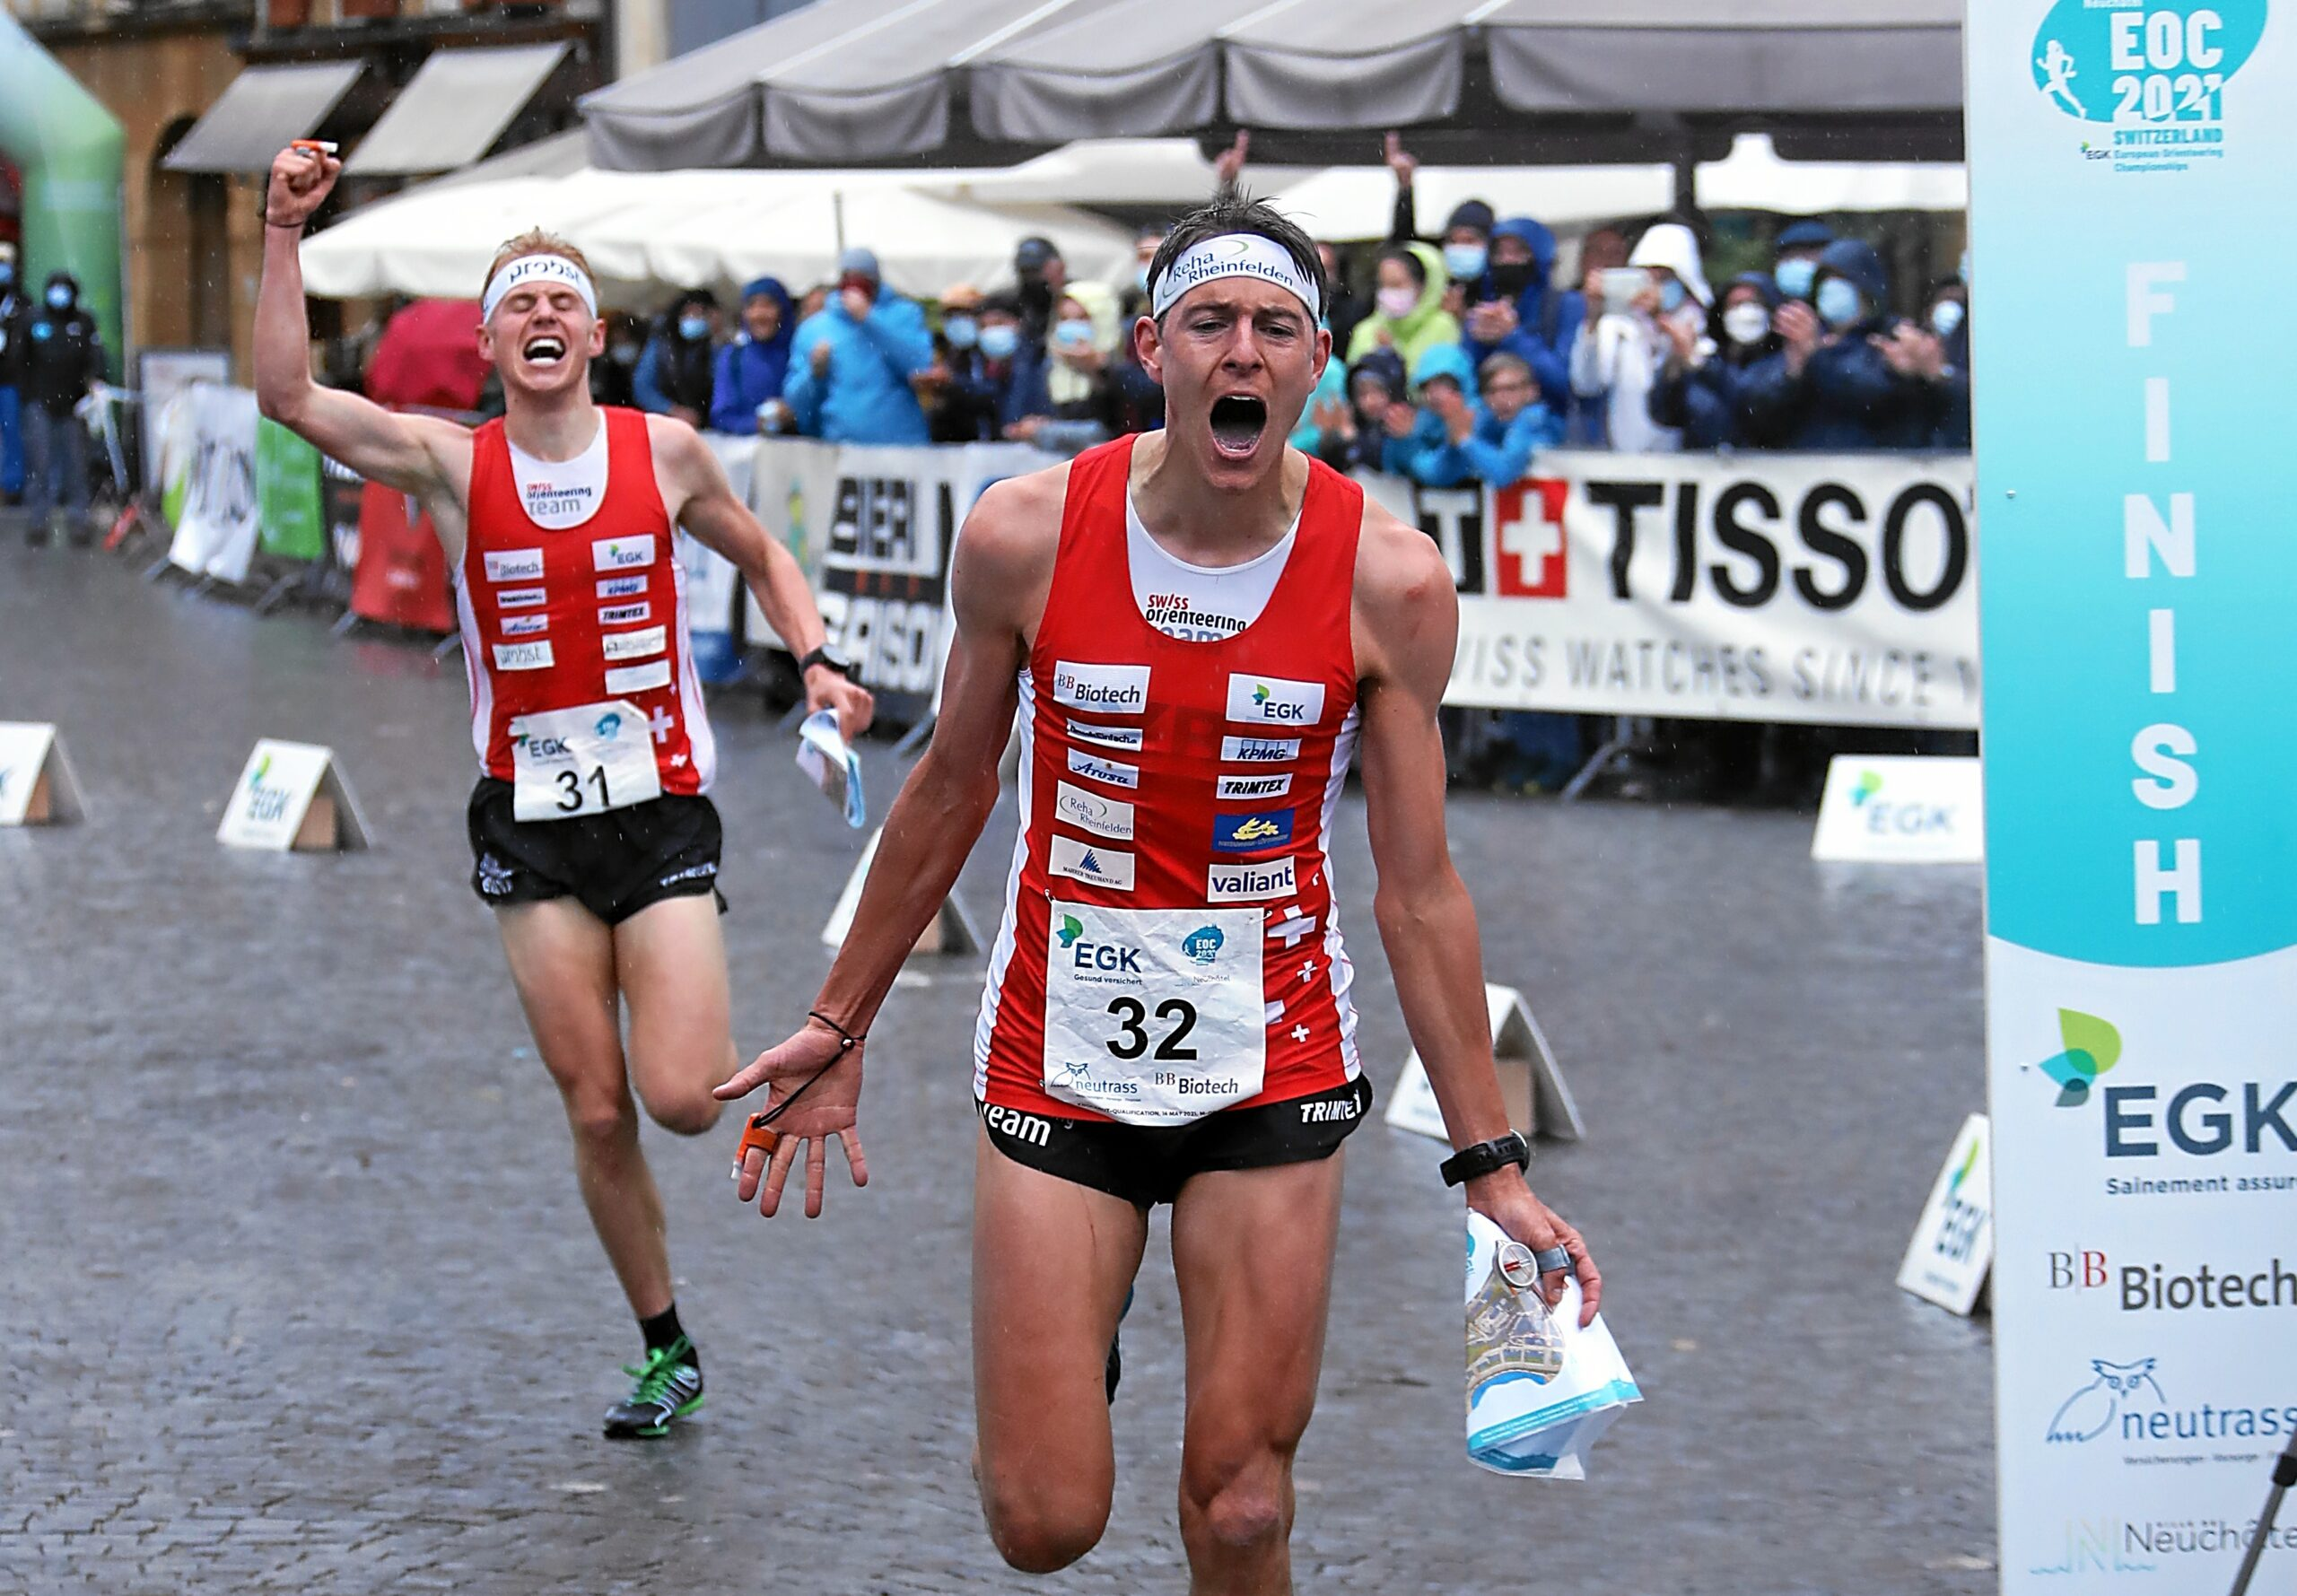 EOC 2021: KO Sprint Finals Men – Men Matthias Kyburz (SUI) New European Champion